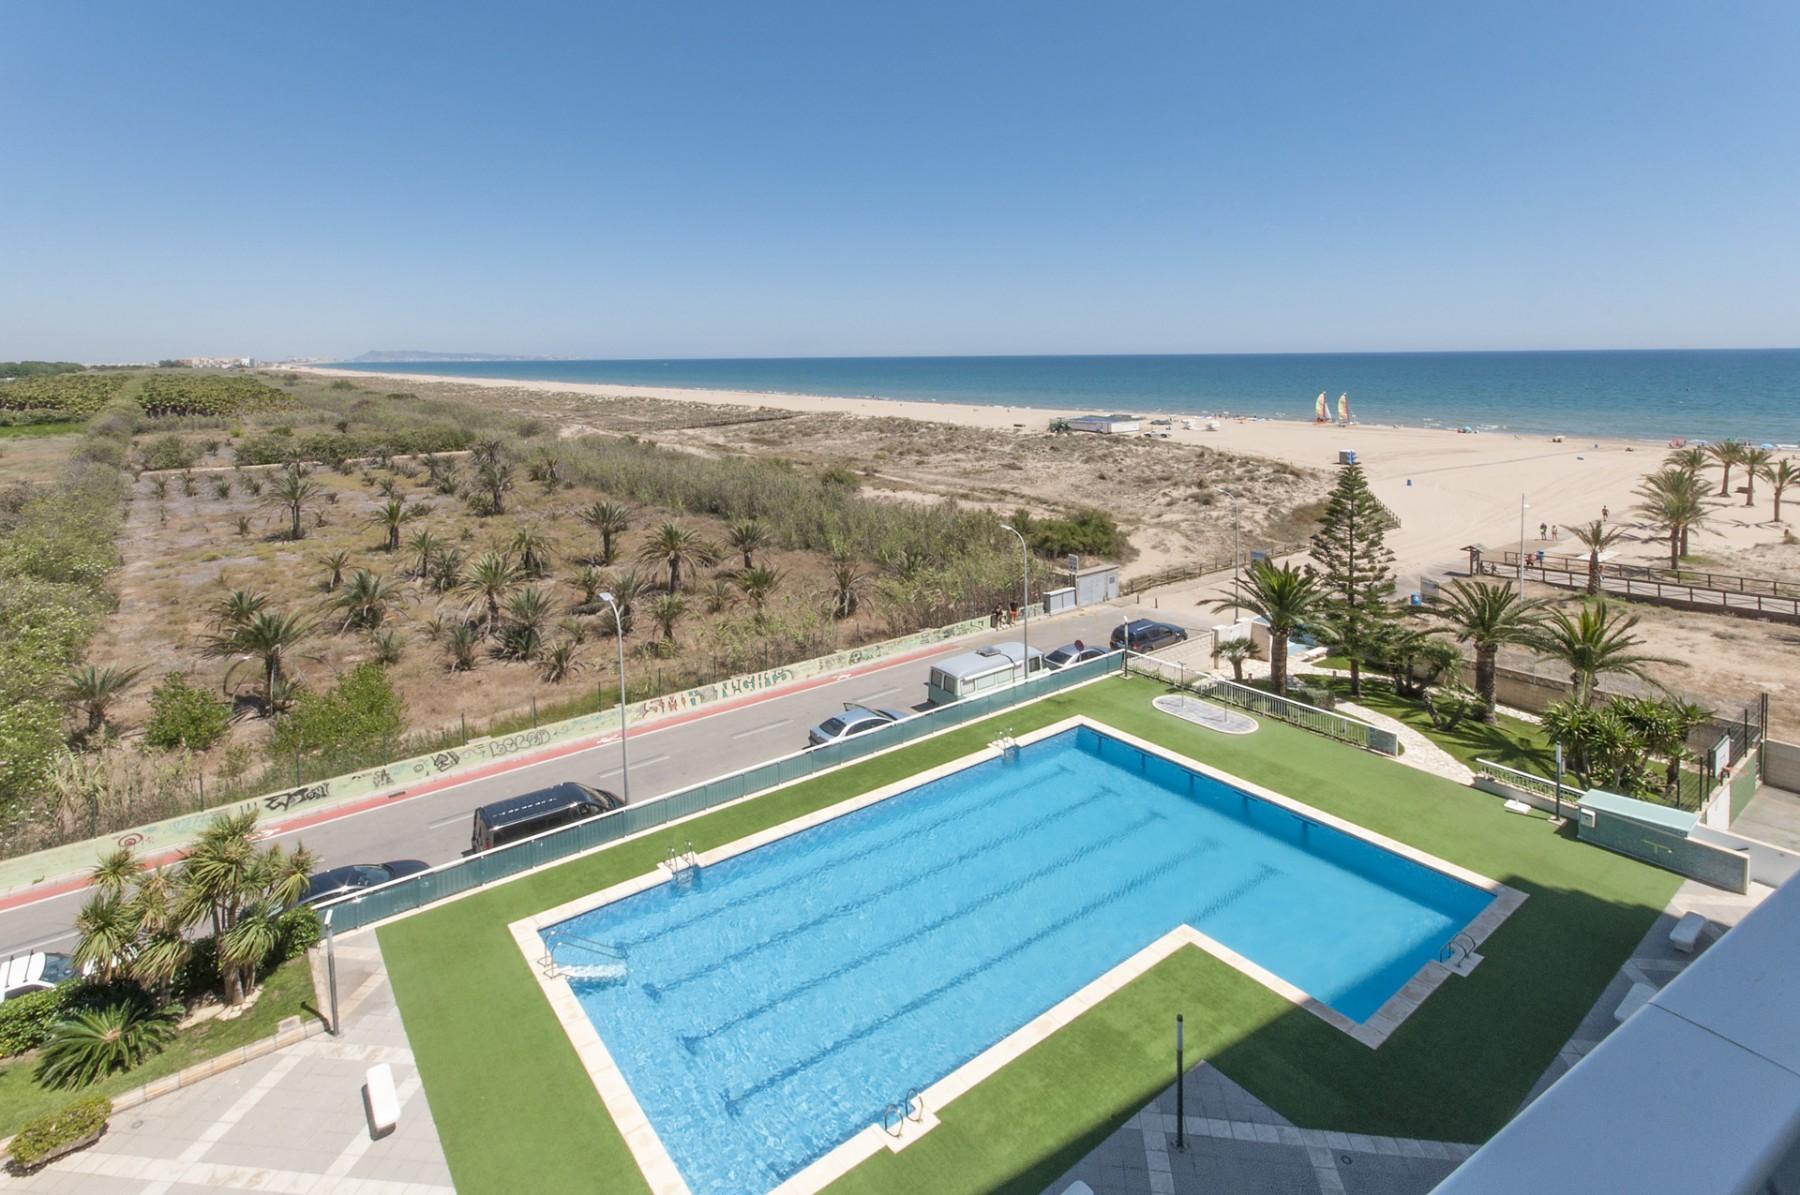 Apartamentos playa de gandia alquiler de apartamentos en - Apartamentos baratos gandia ...